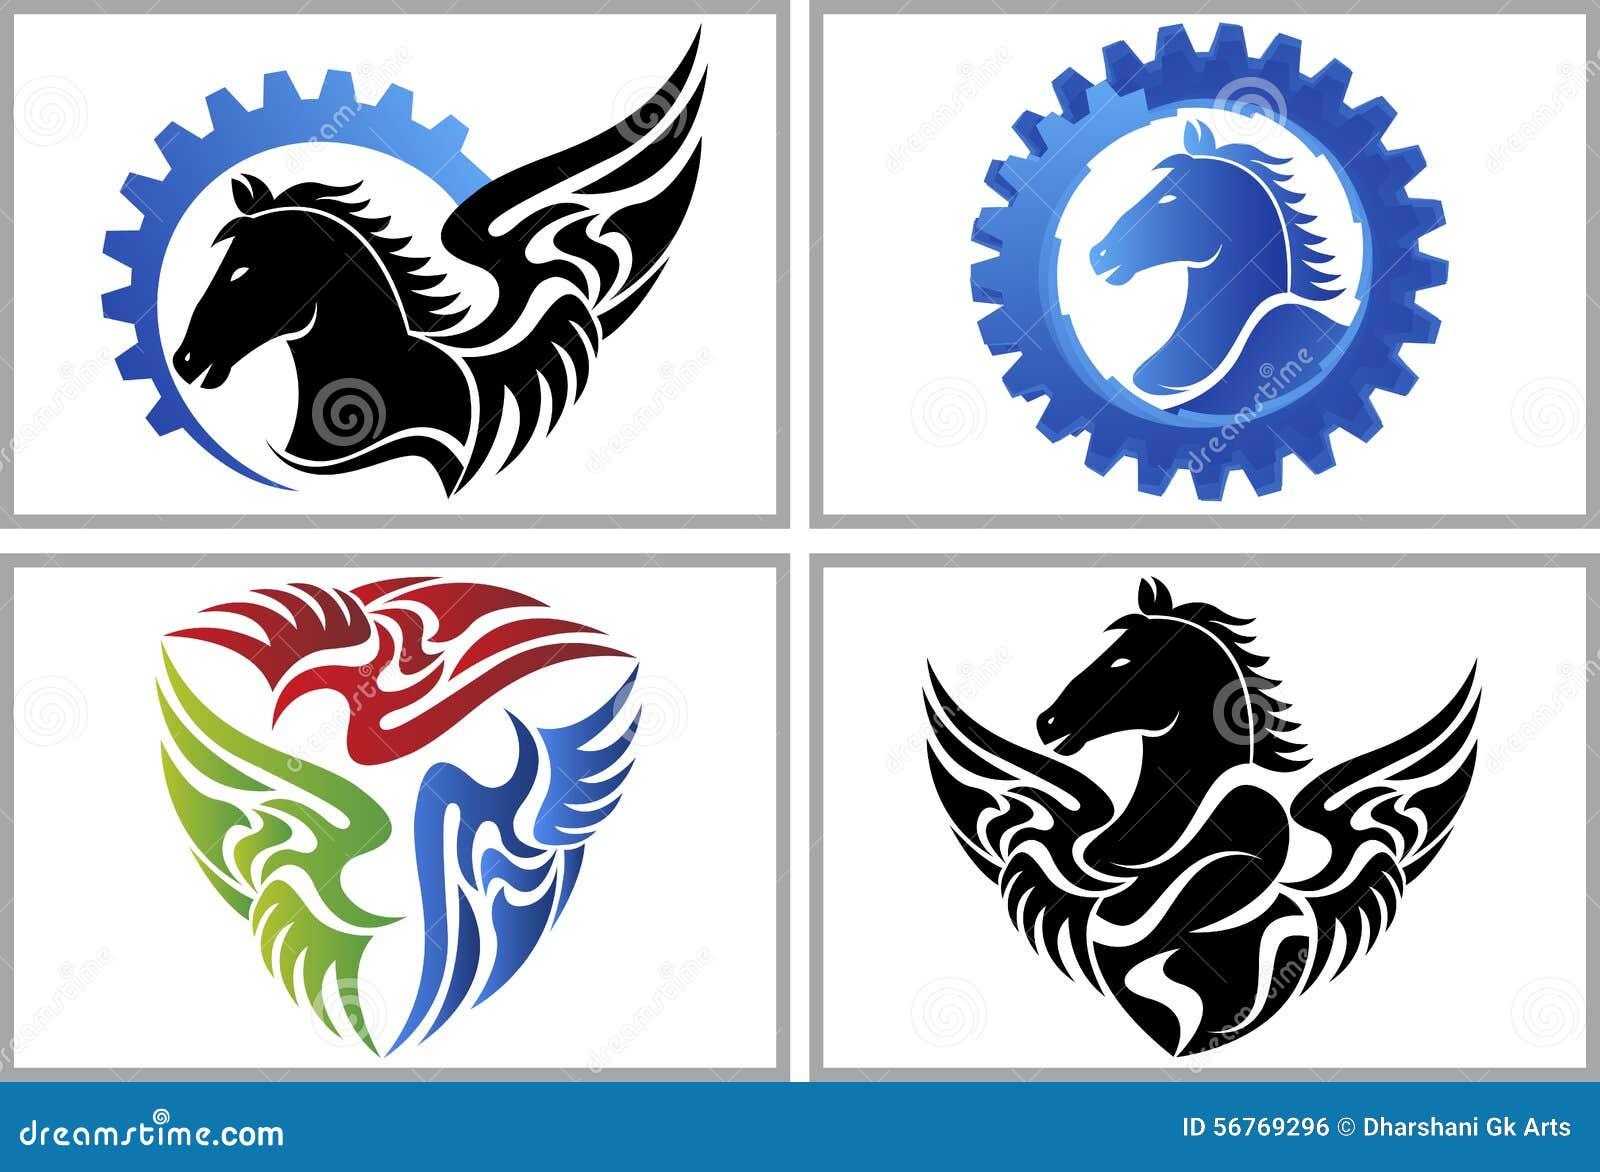 Fly Horse Logo Stock Vector Illustration Of Heat Design 56769296